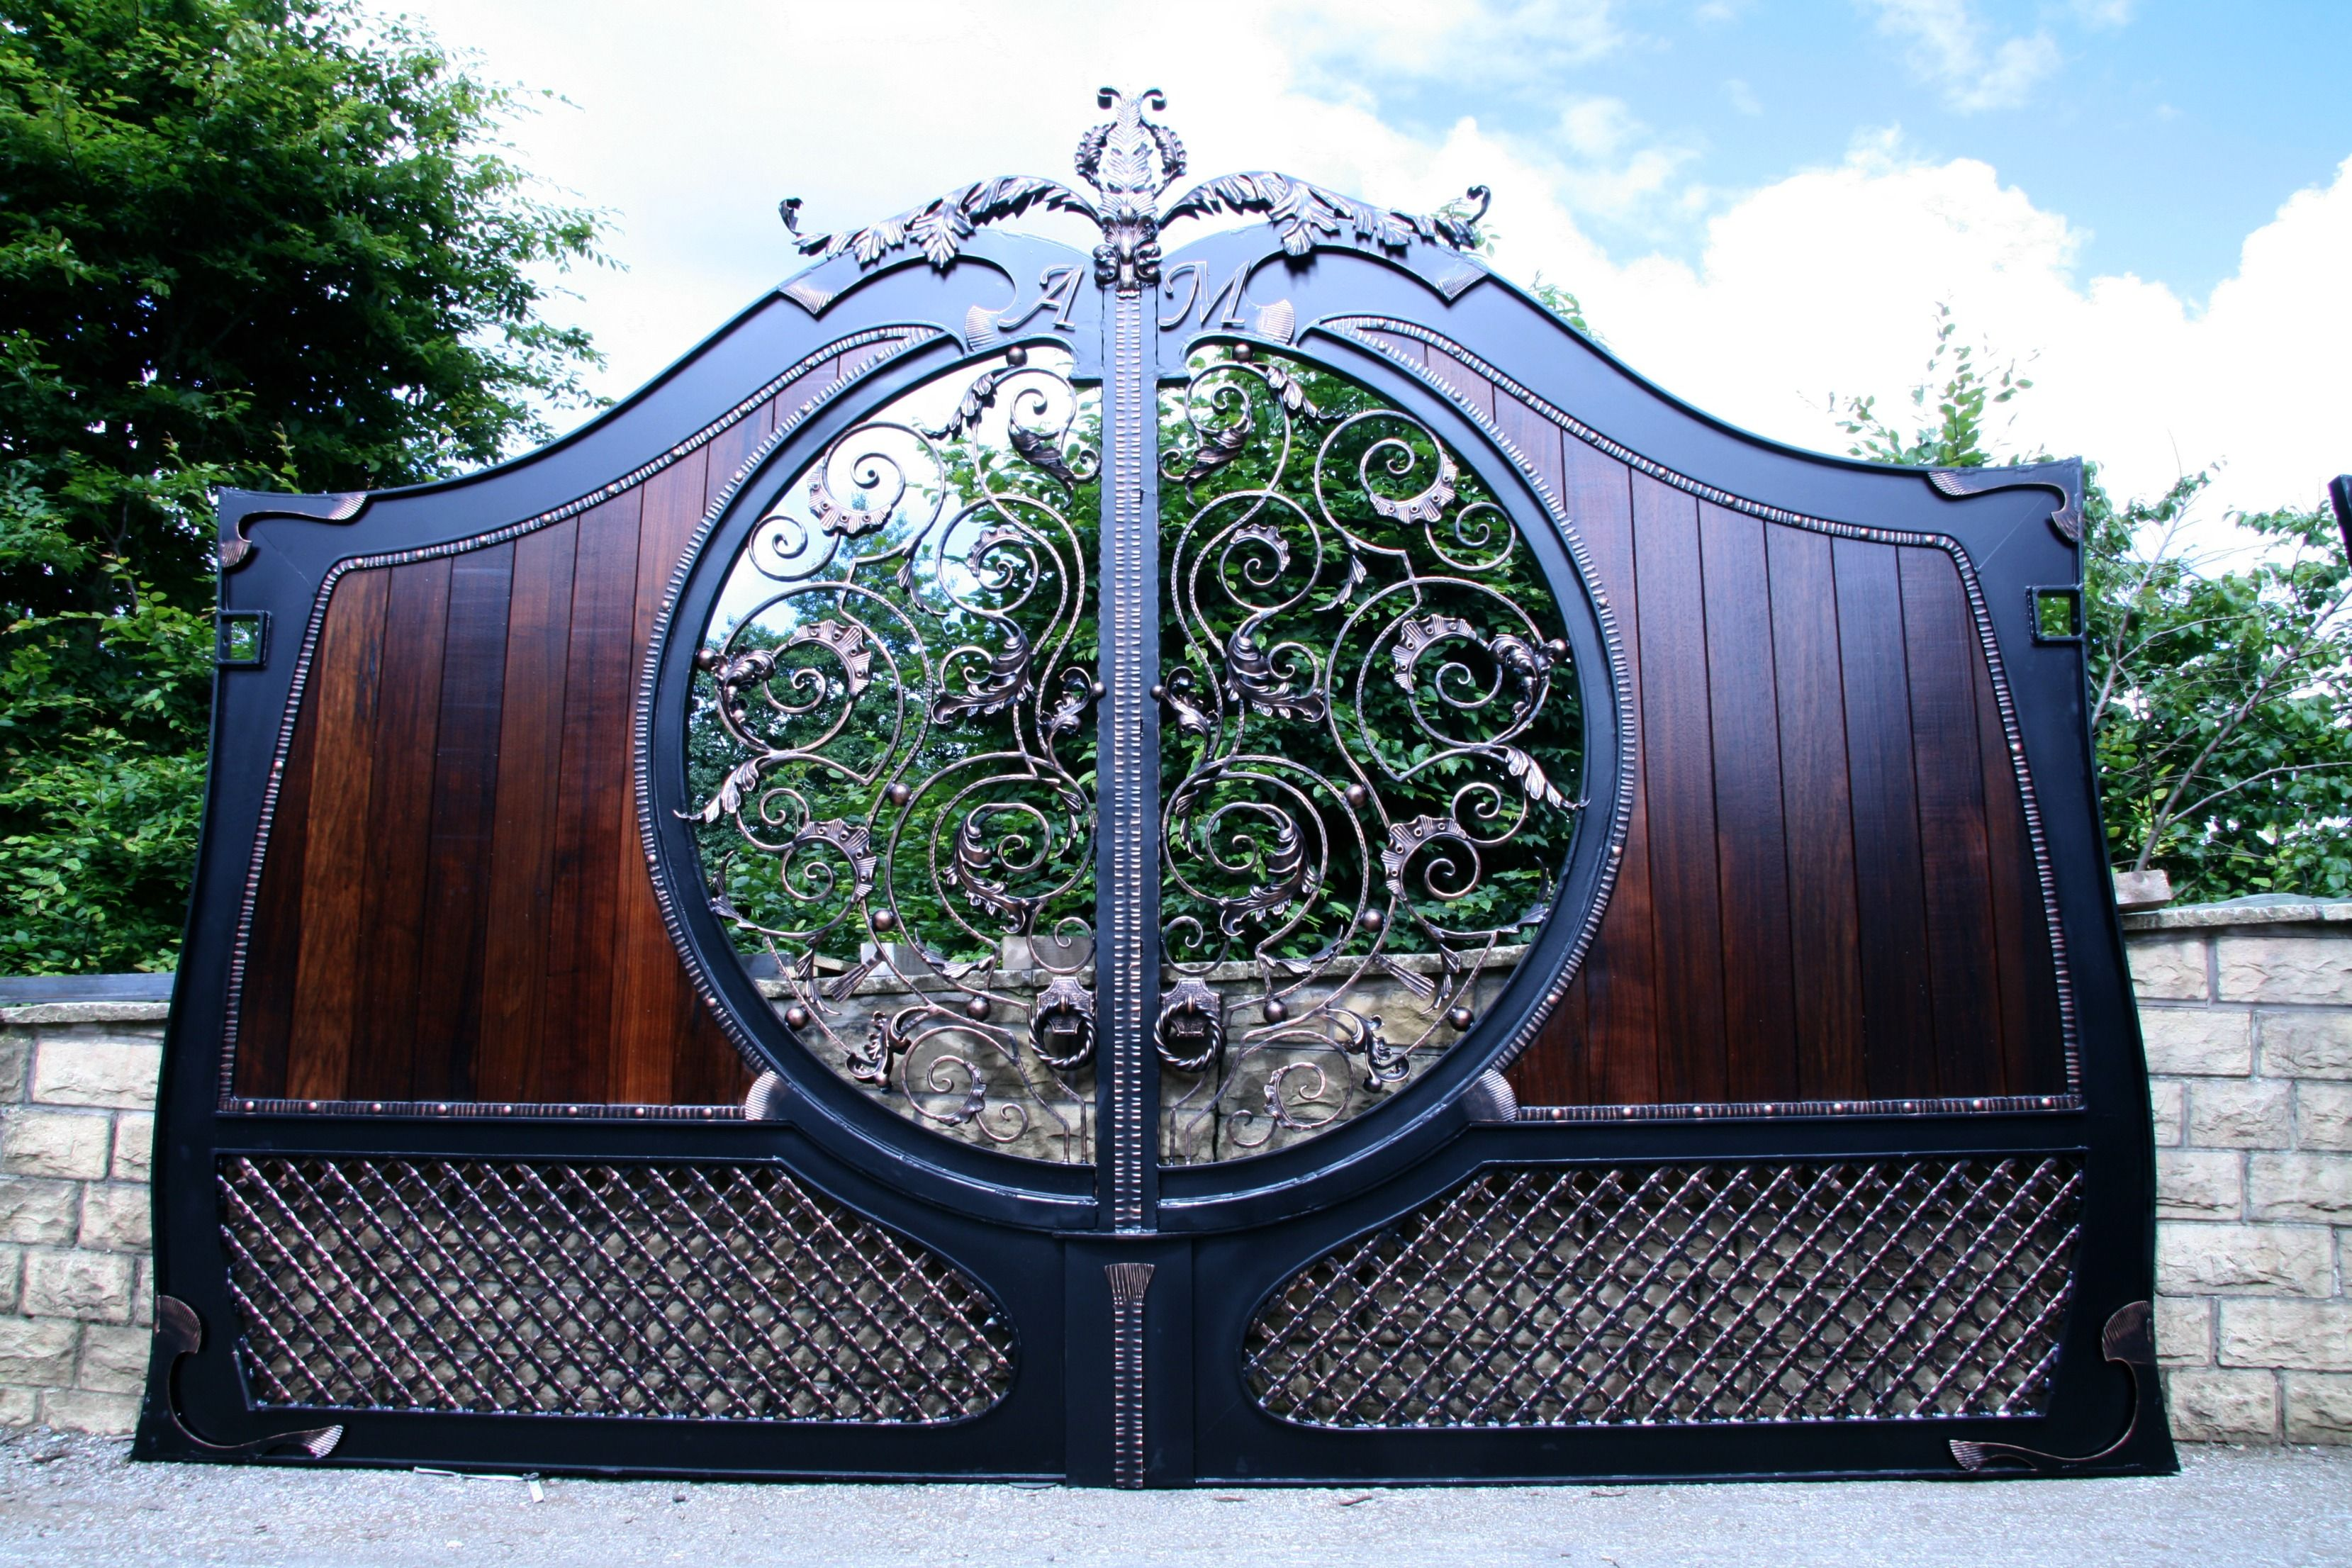 Aphrodite Timber Gates With Bronze Patina Ironwork Timber Gate Design Manufacturer Art Entrance Driveway Home Gate Design Iron Gate Design Iron Gates